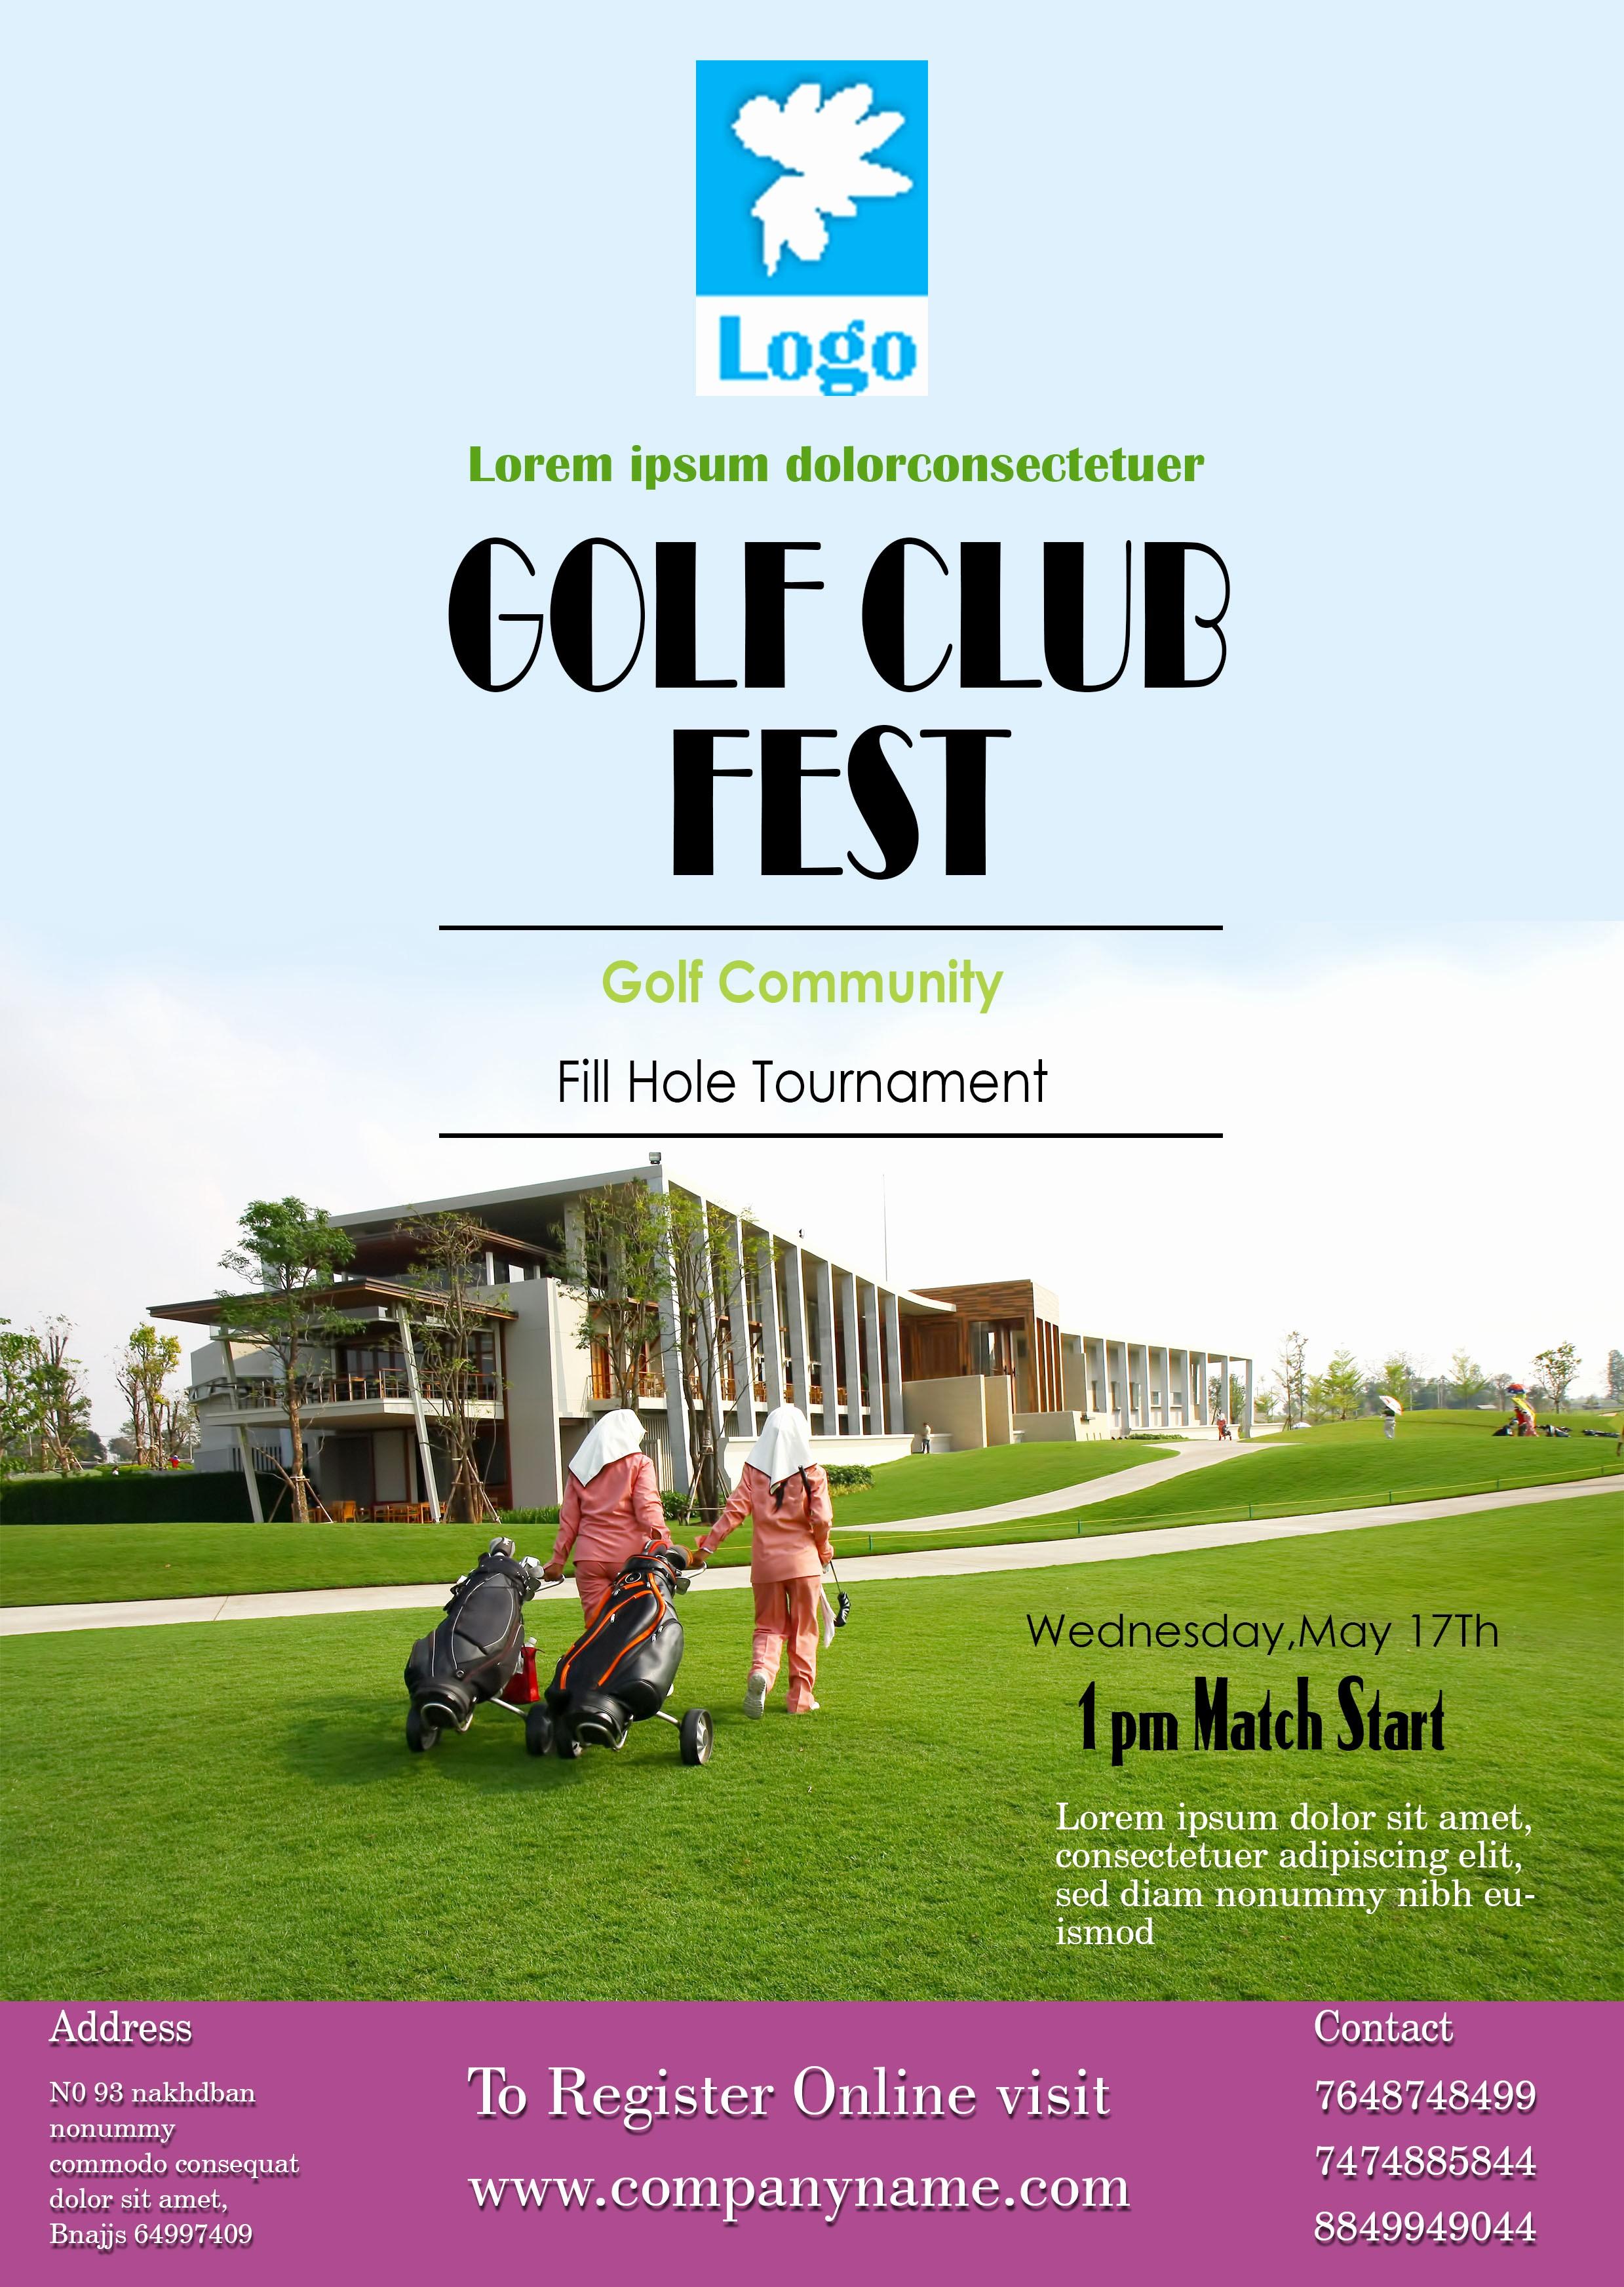 Golf tournament Flyer Template Word Best Of 15 Free Golf tournament Flyer Templates Fundraiser